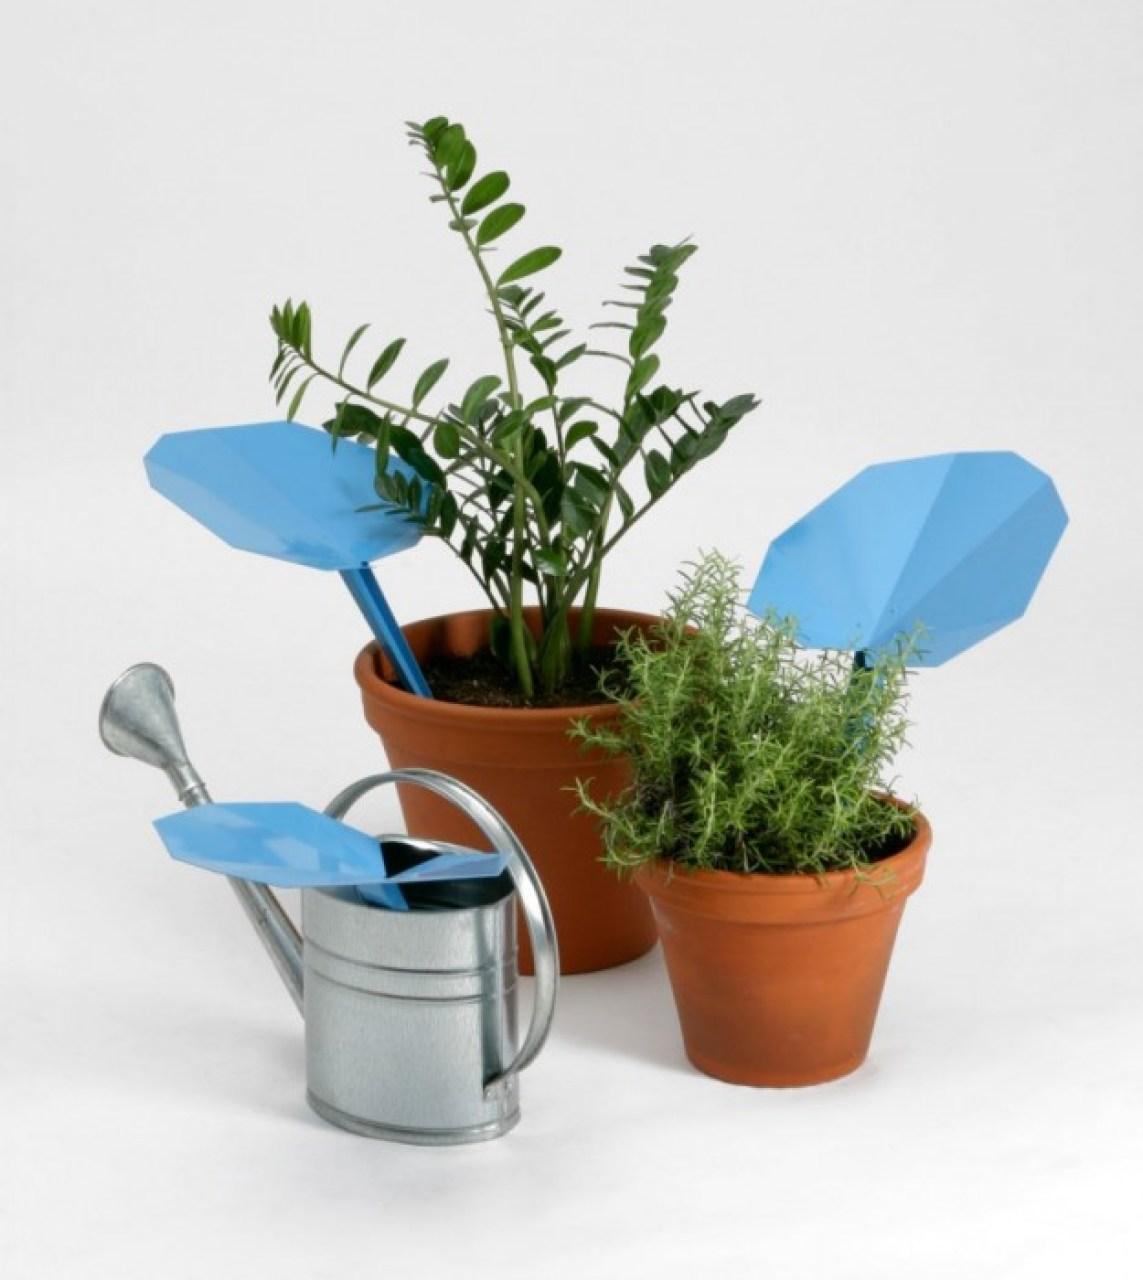 reLEAF-Teracrea-rainwater-collector-1